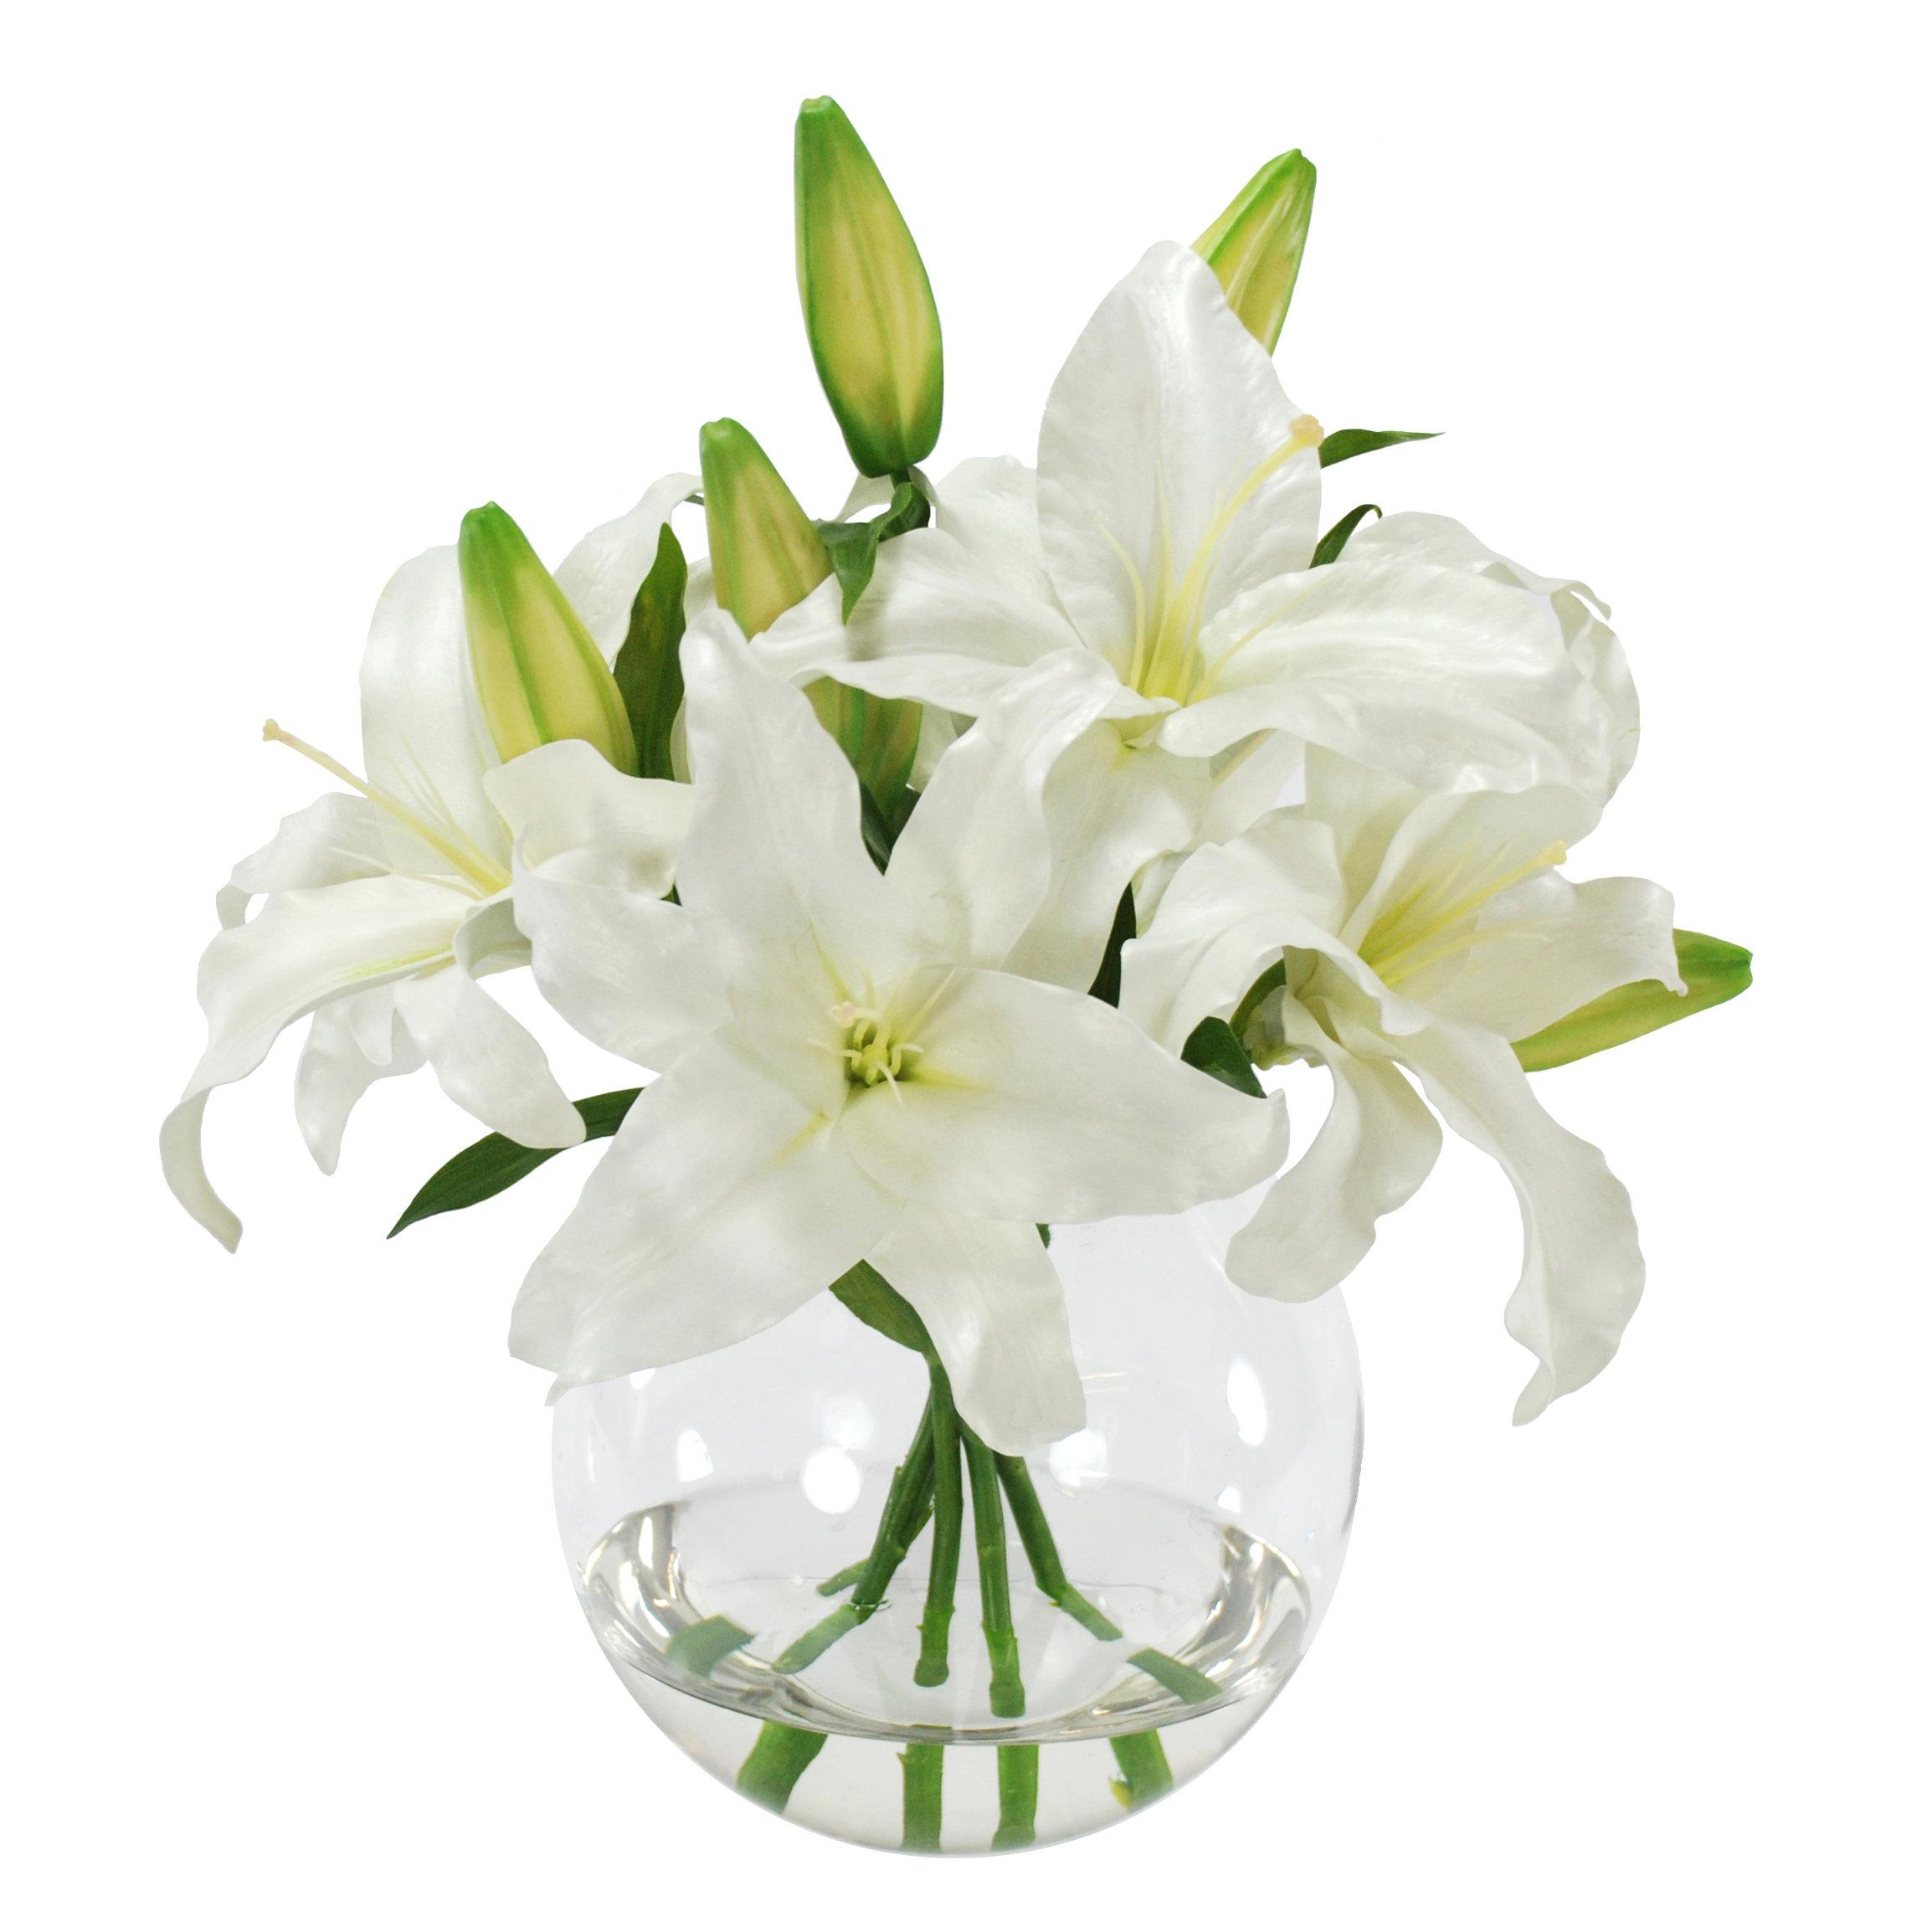 Casablanca Lily Floral Arrangement In Glass Vase Reviews Joss Main